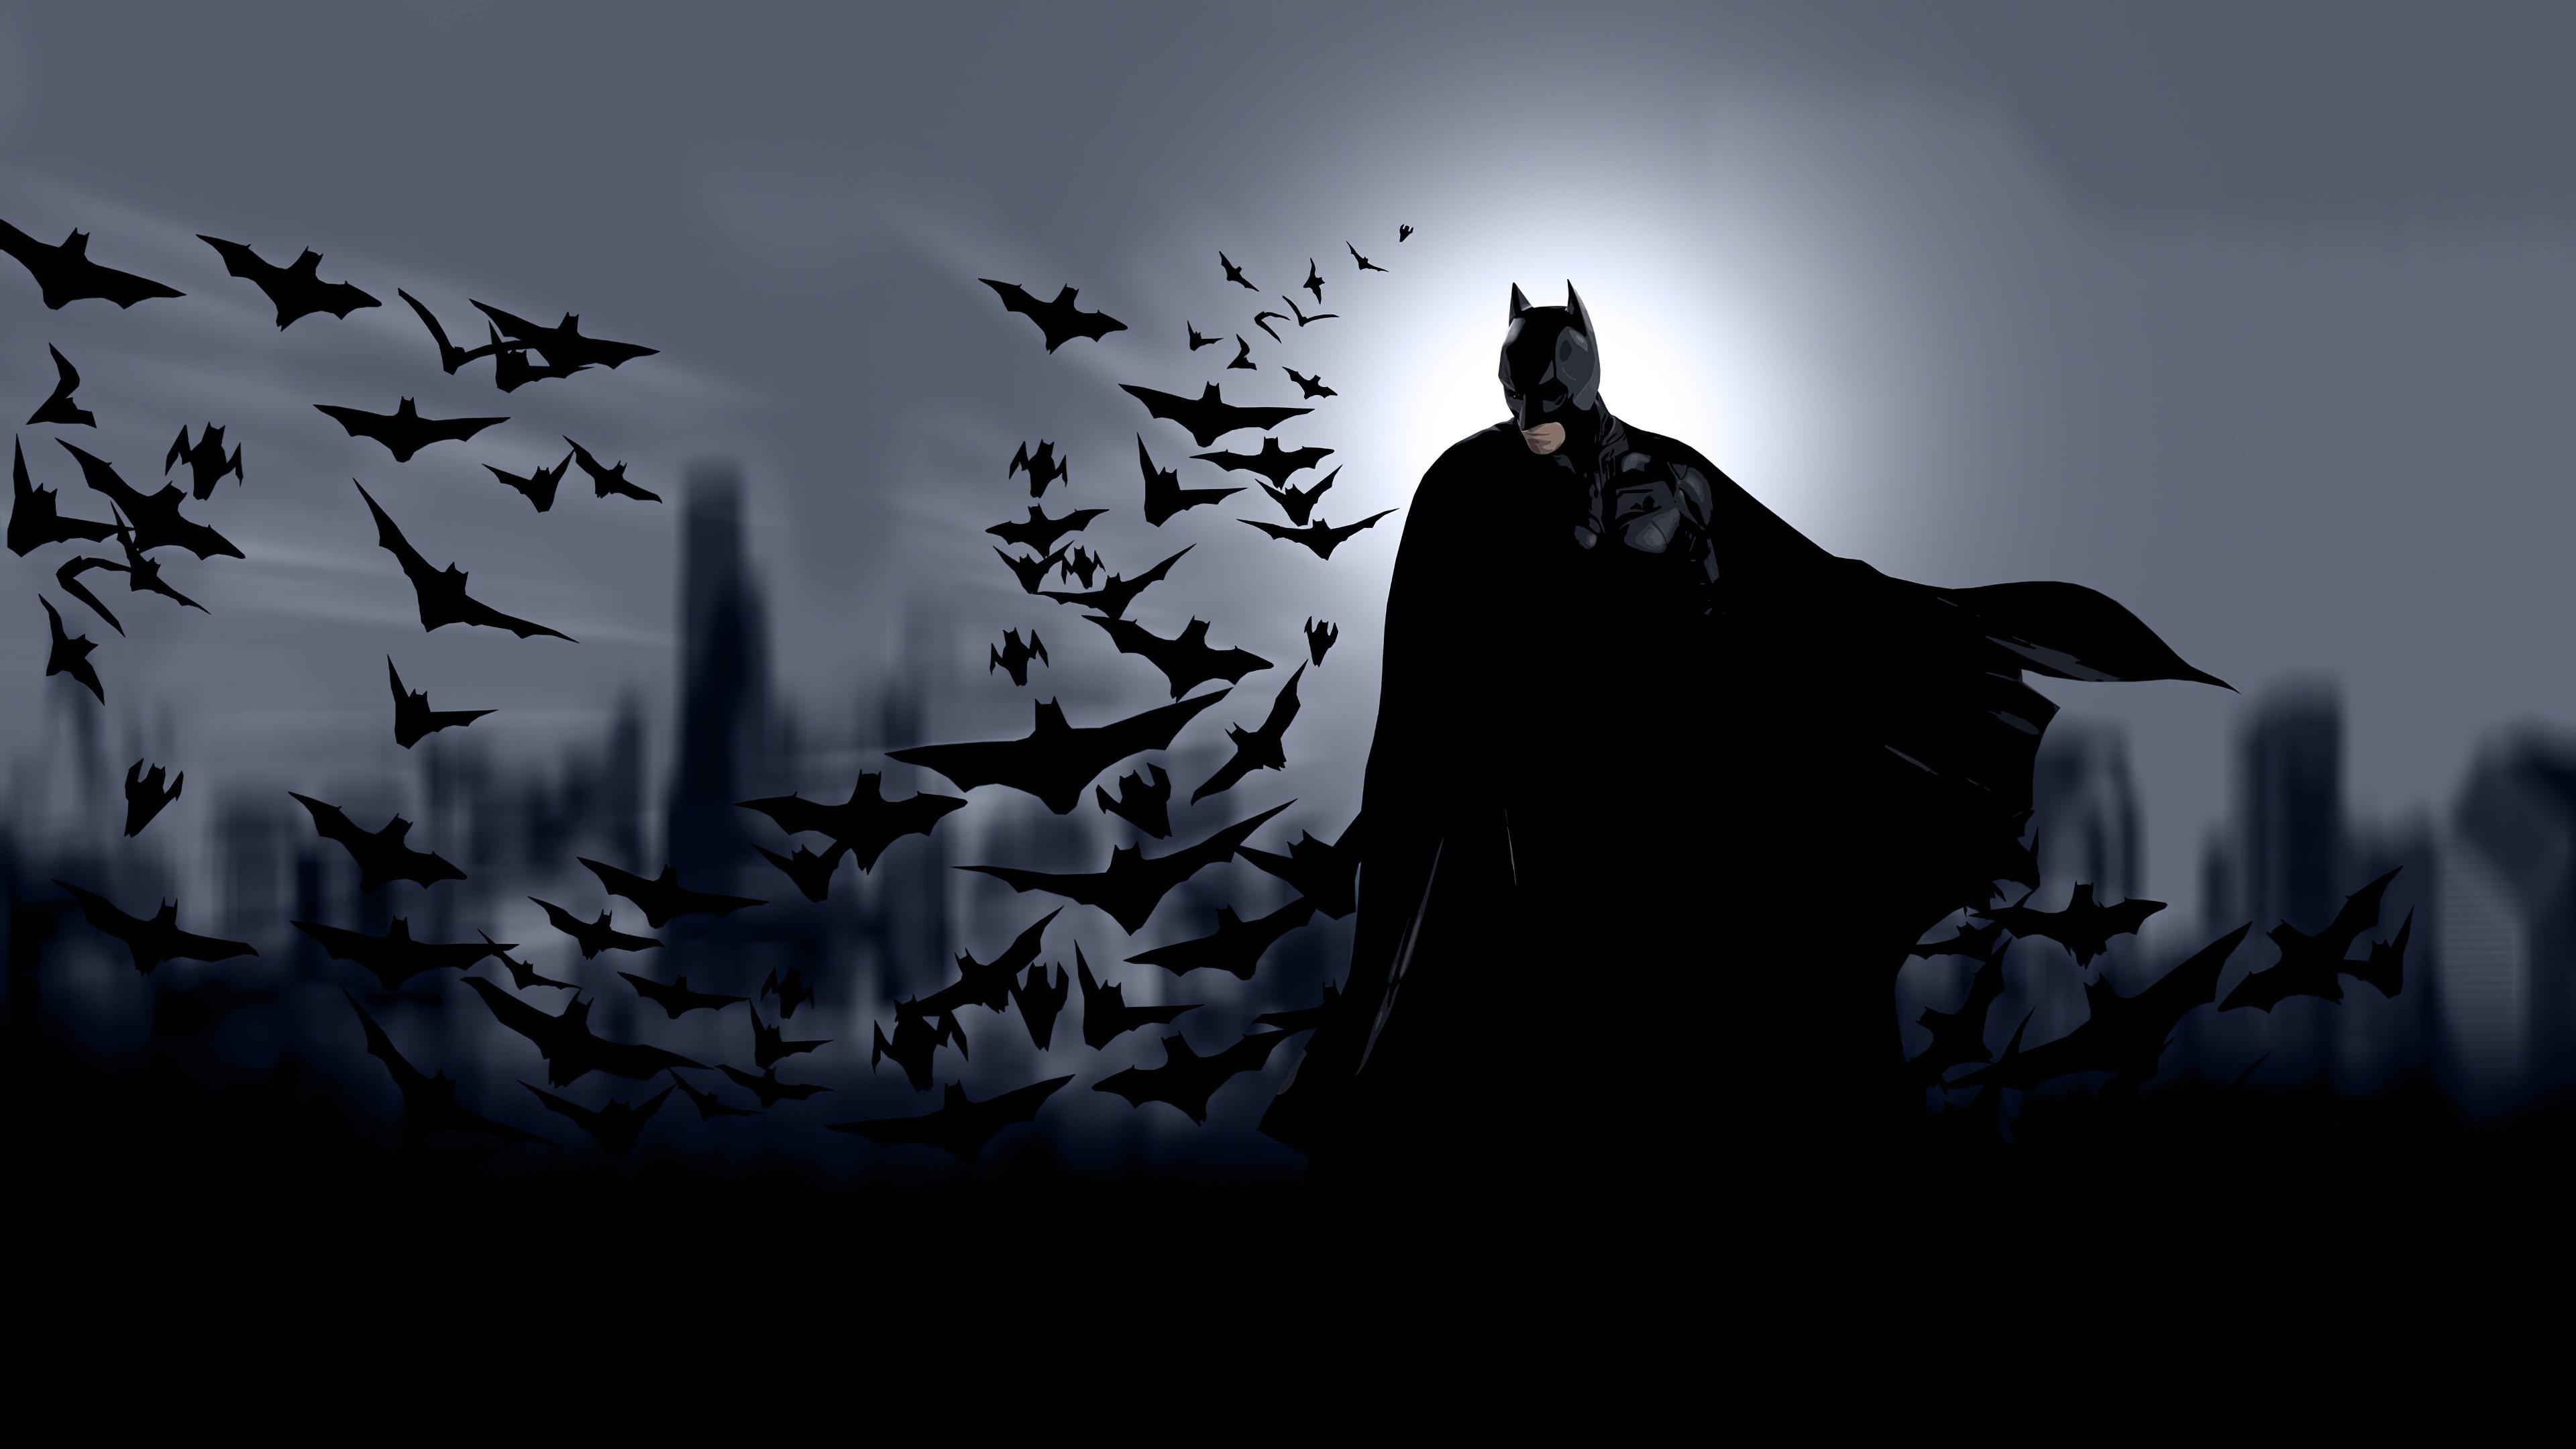 Wallpaper 4k Batman Dark Art Batman 4k Hd Wallpaper Batman Art Wallpaper 4k Batman Wallpaper 4k Batman Wallpaper Phone 4k Hd Dark Knight Wallpaper 4k